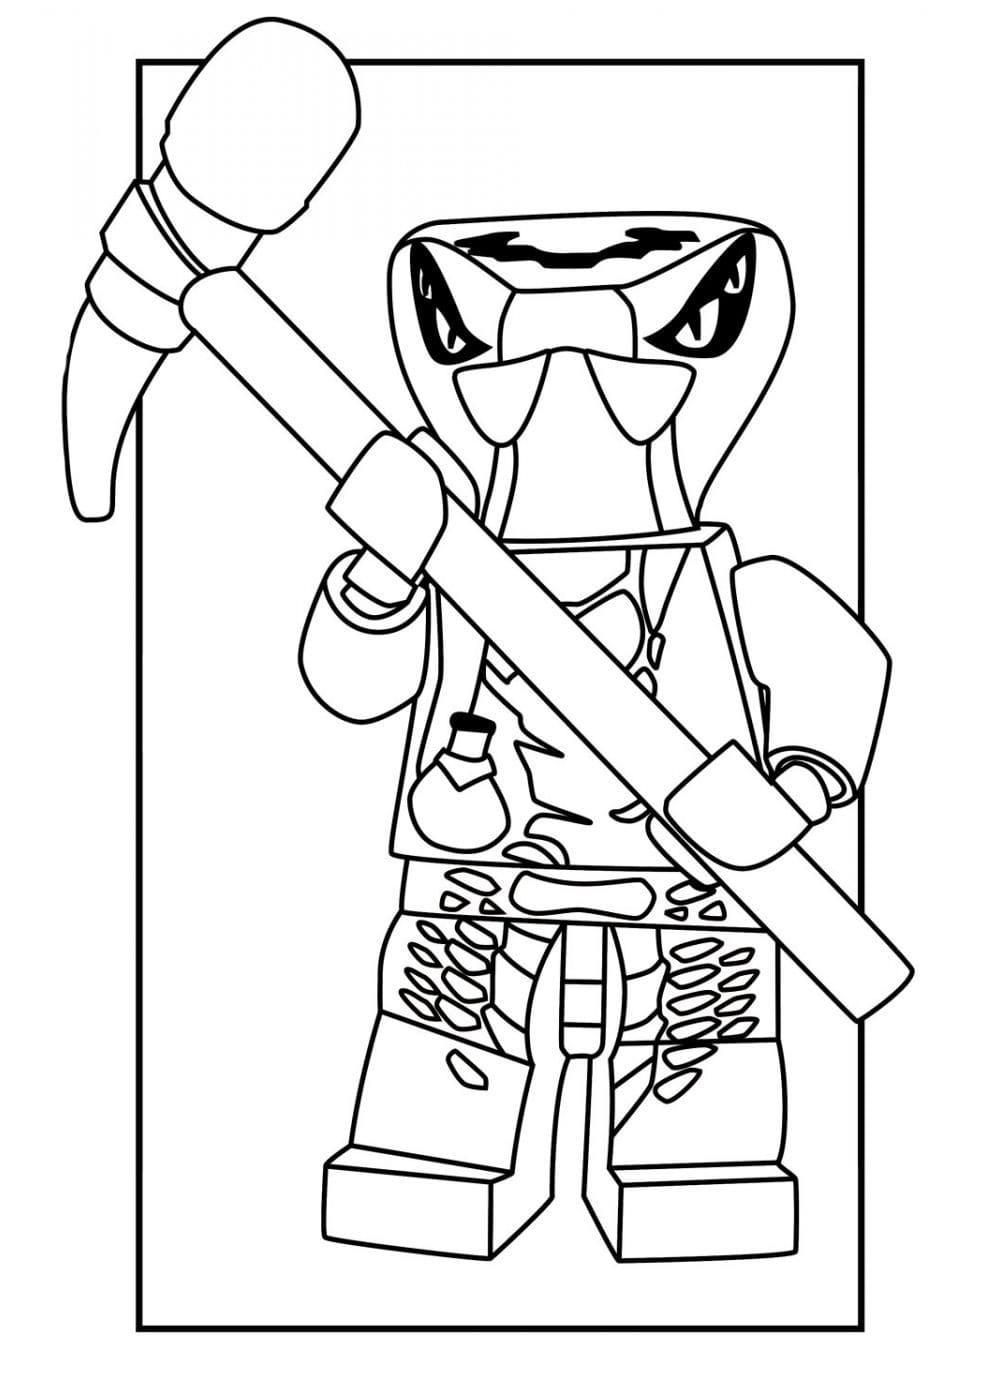 ausmalbilder lego ninjago 100 stück kostenlos drucken a4